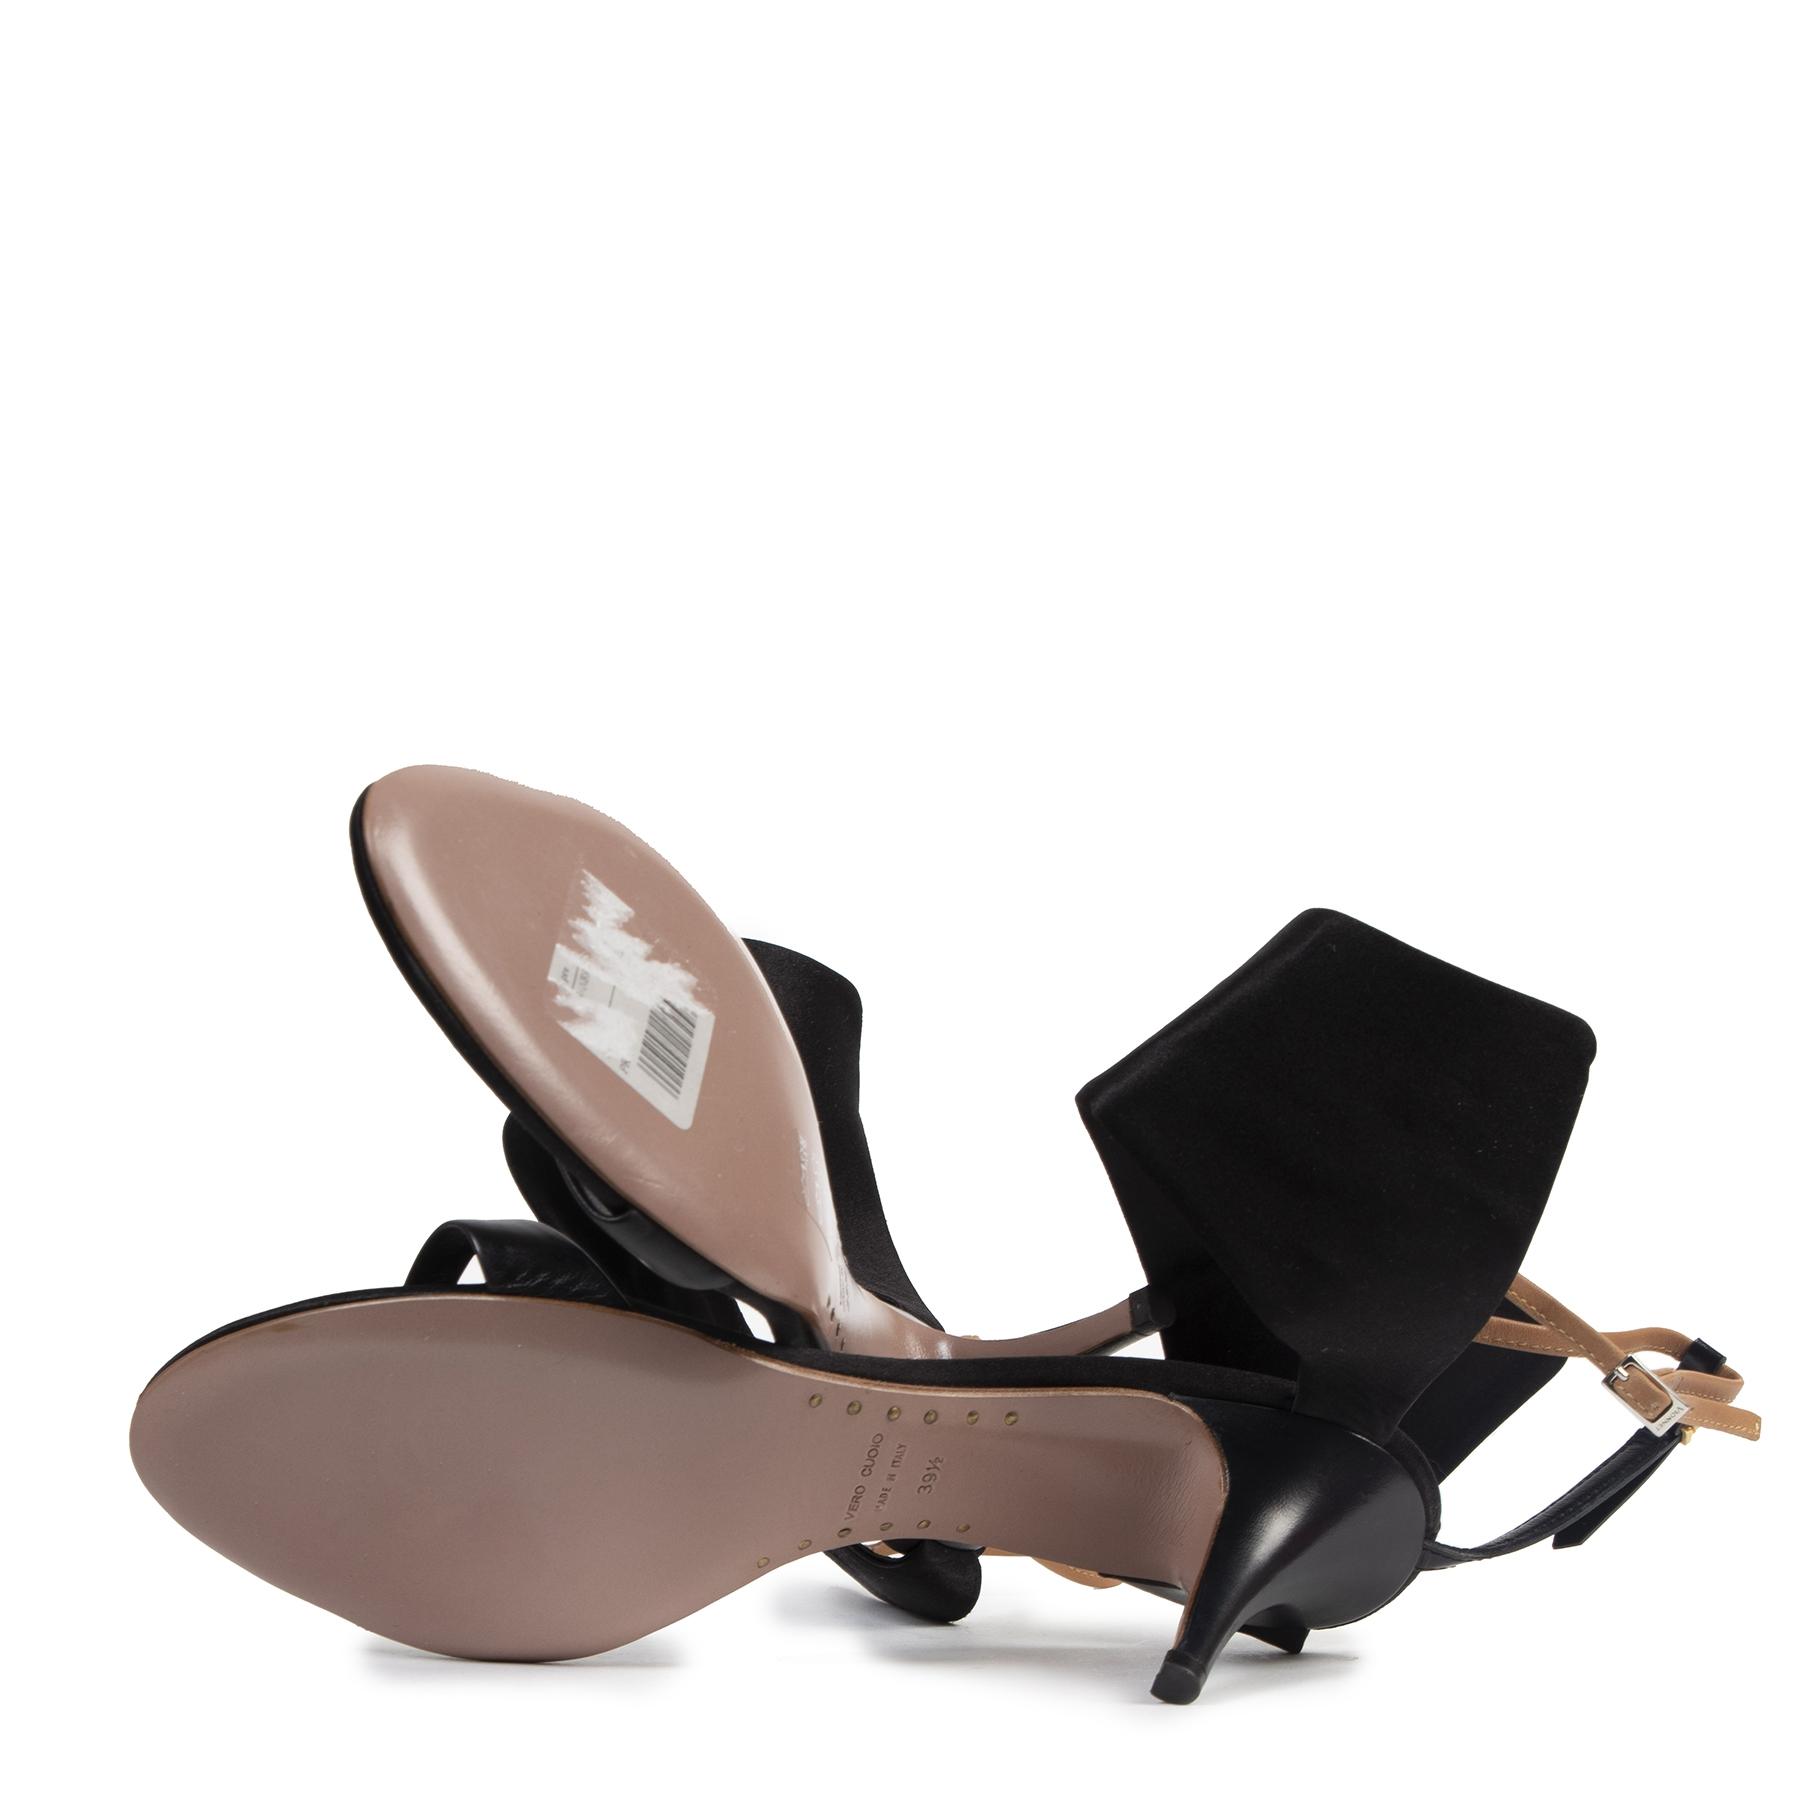 Authentieke tweedehands vintage Giuseppe Zanotti x Vionnet Black Kitten Heels - Size 39,5 koop online webshop LabelLOV